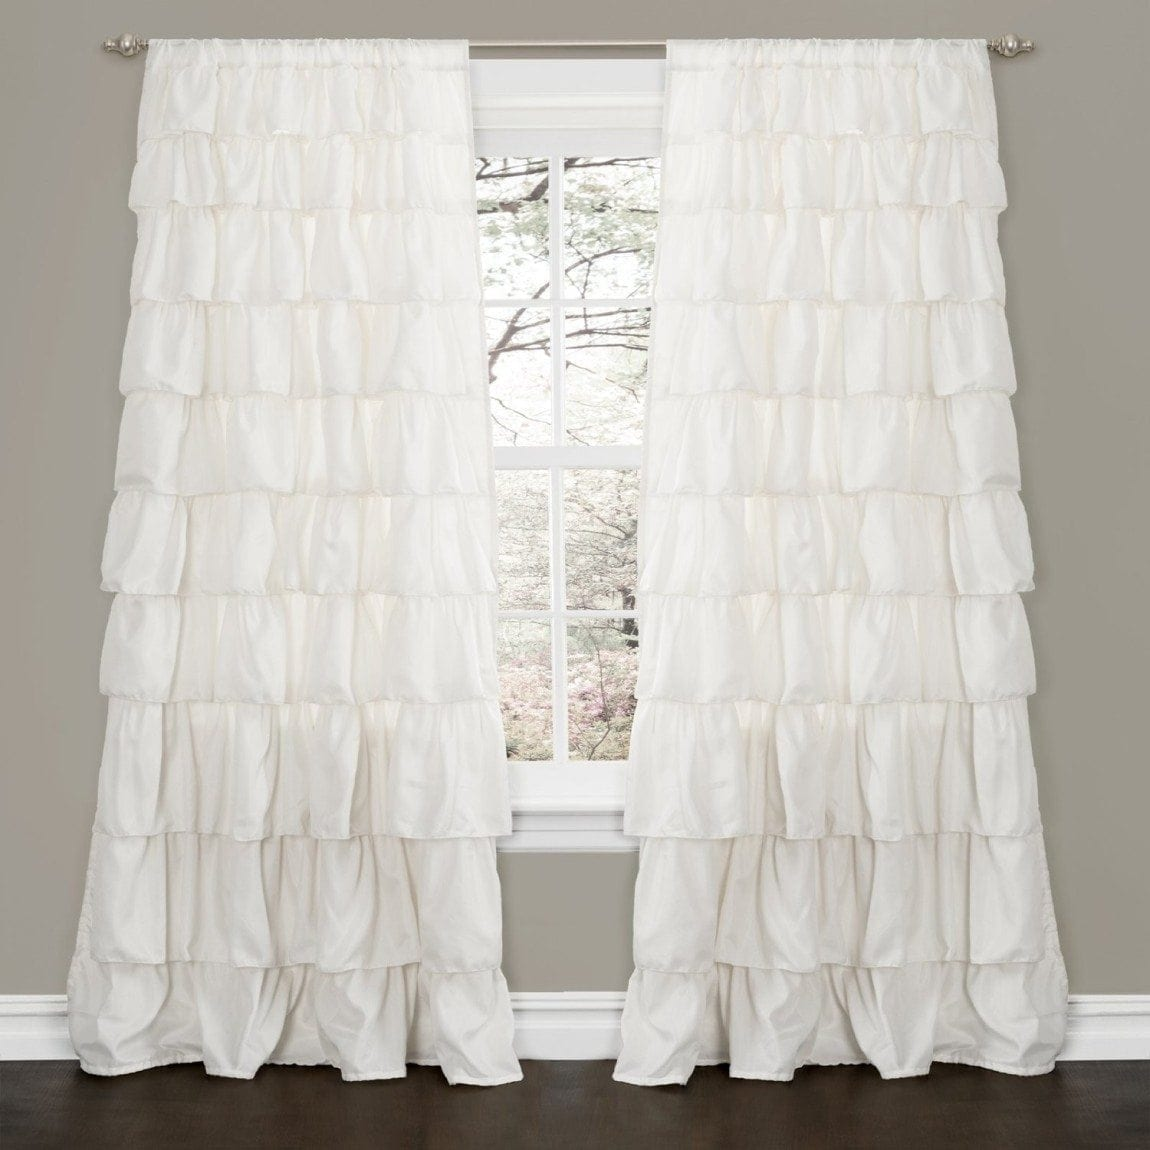 Lush Decor Ruffle Window Curtain, Ivory